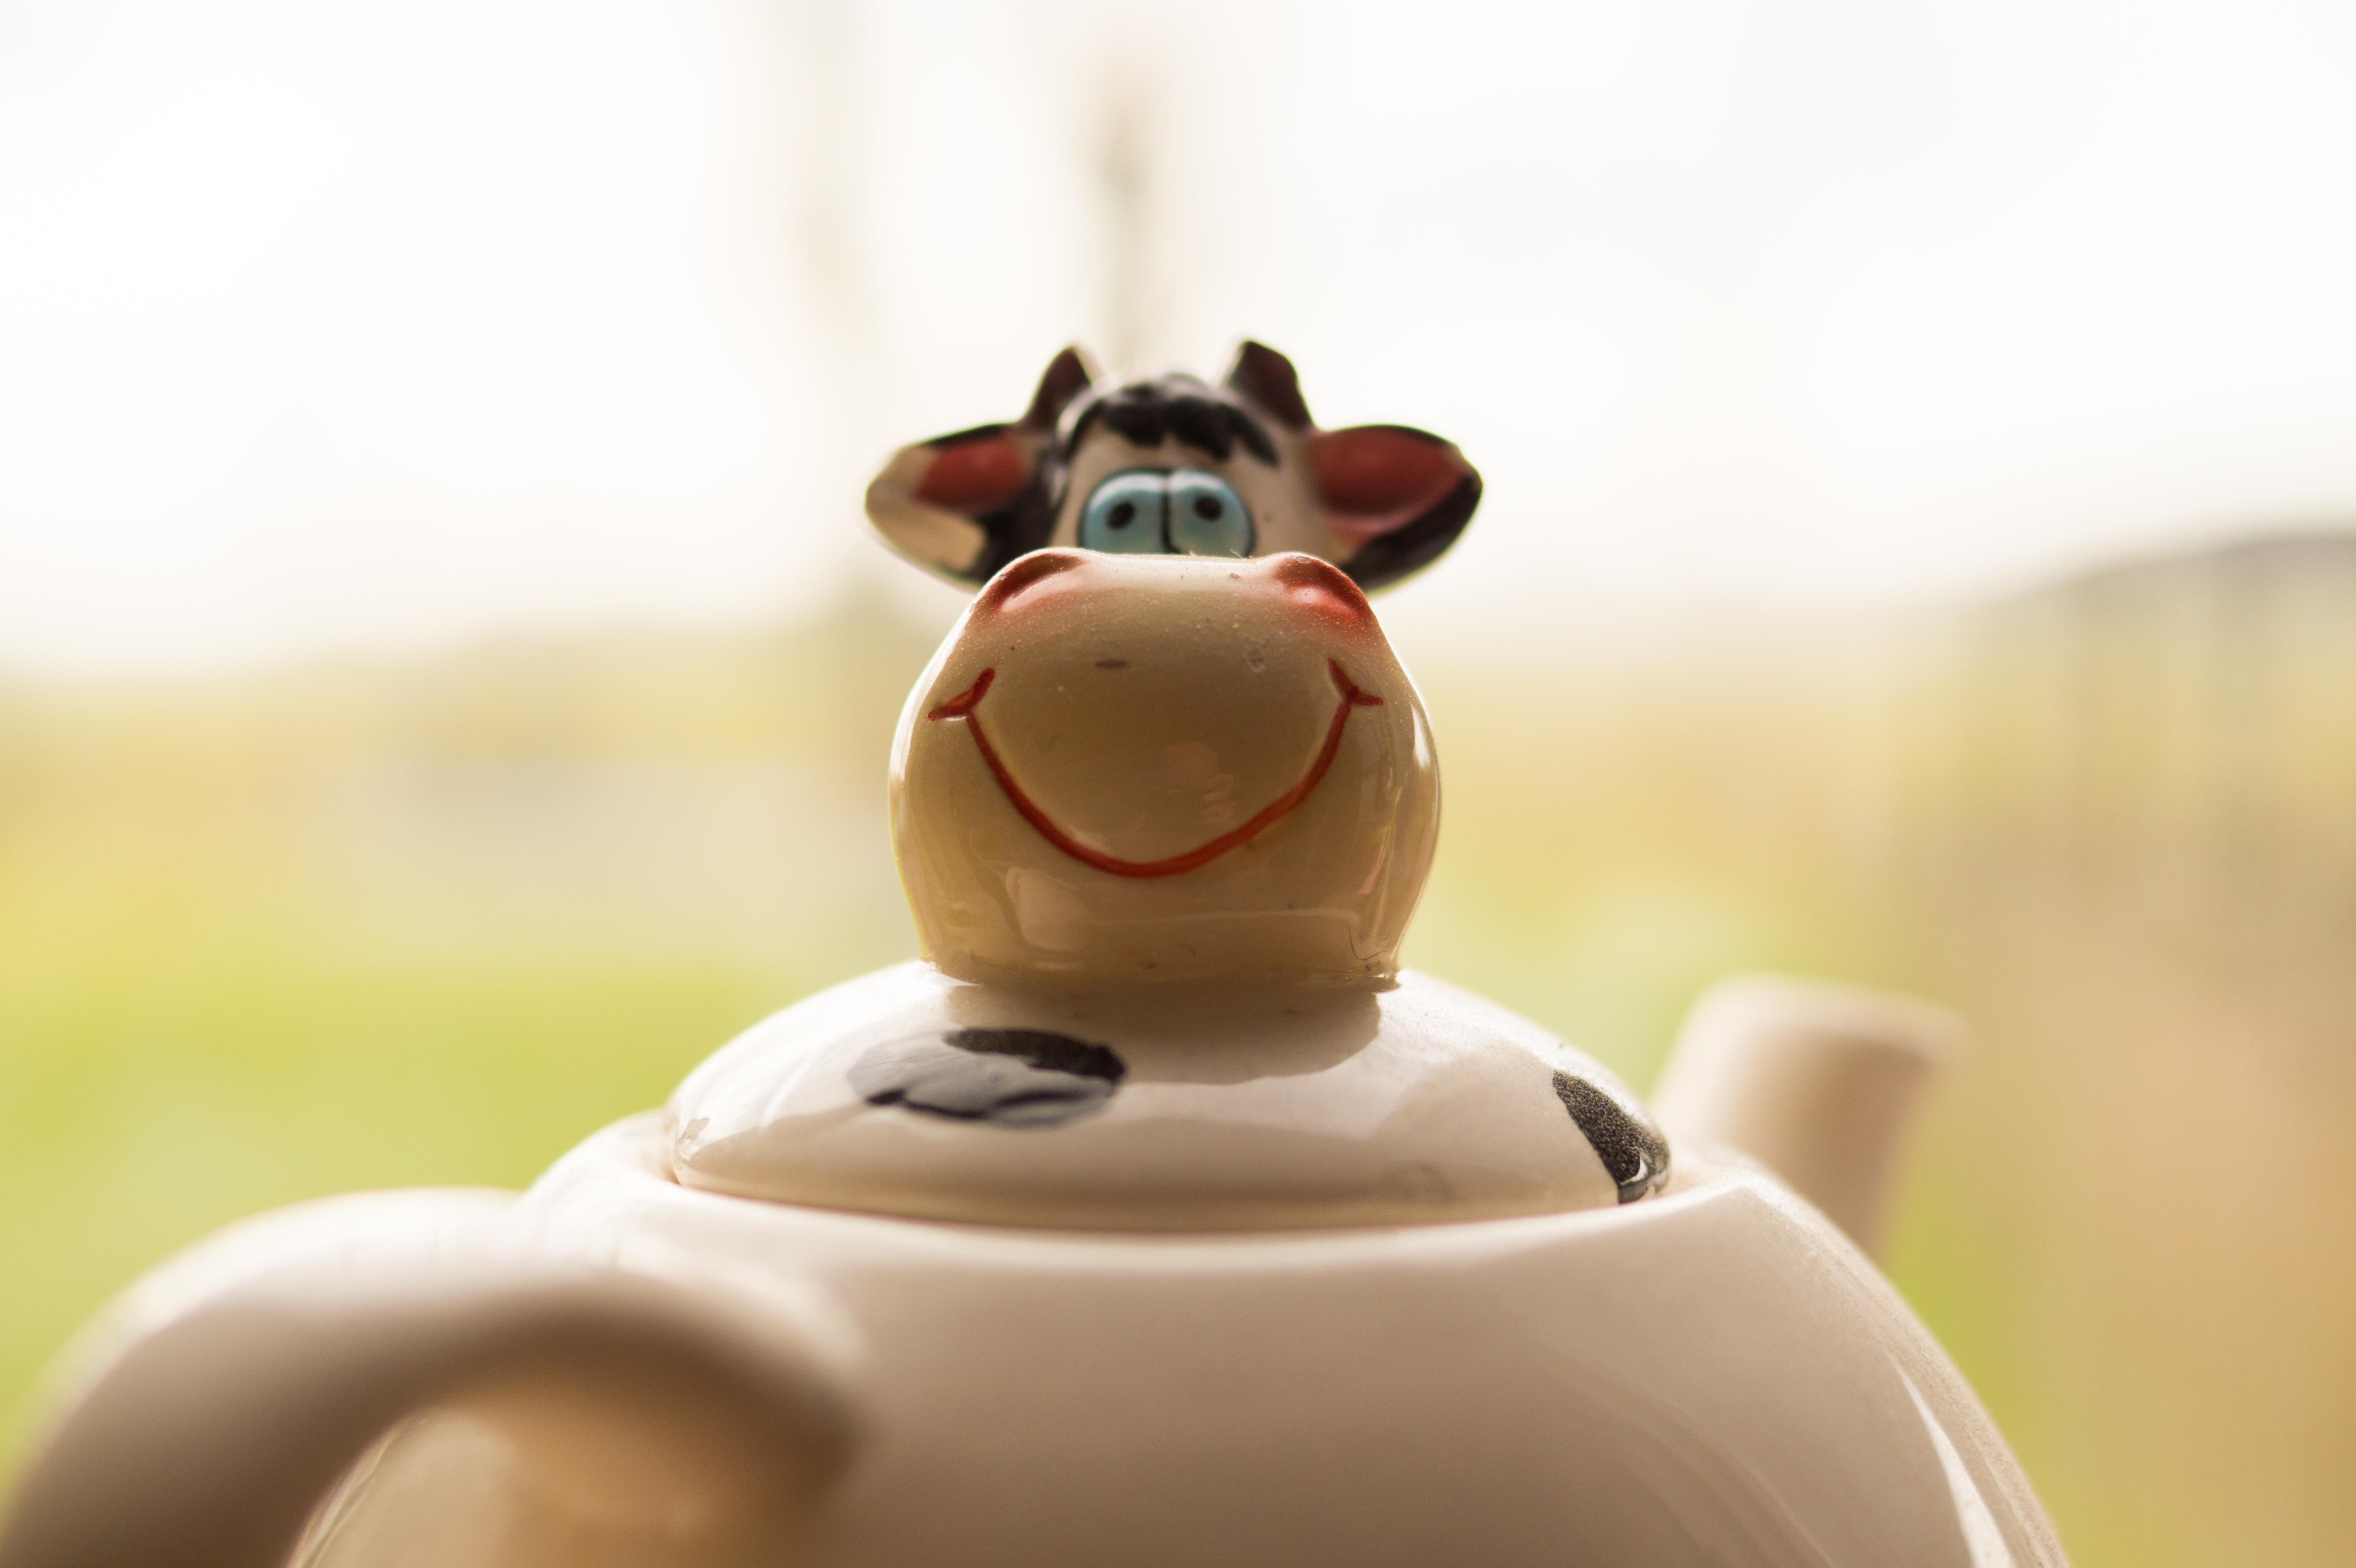 tea-cow-life-living-room.jpg (5349×3561)